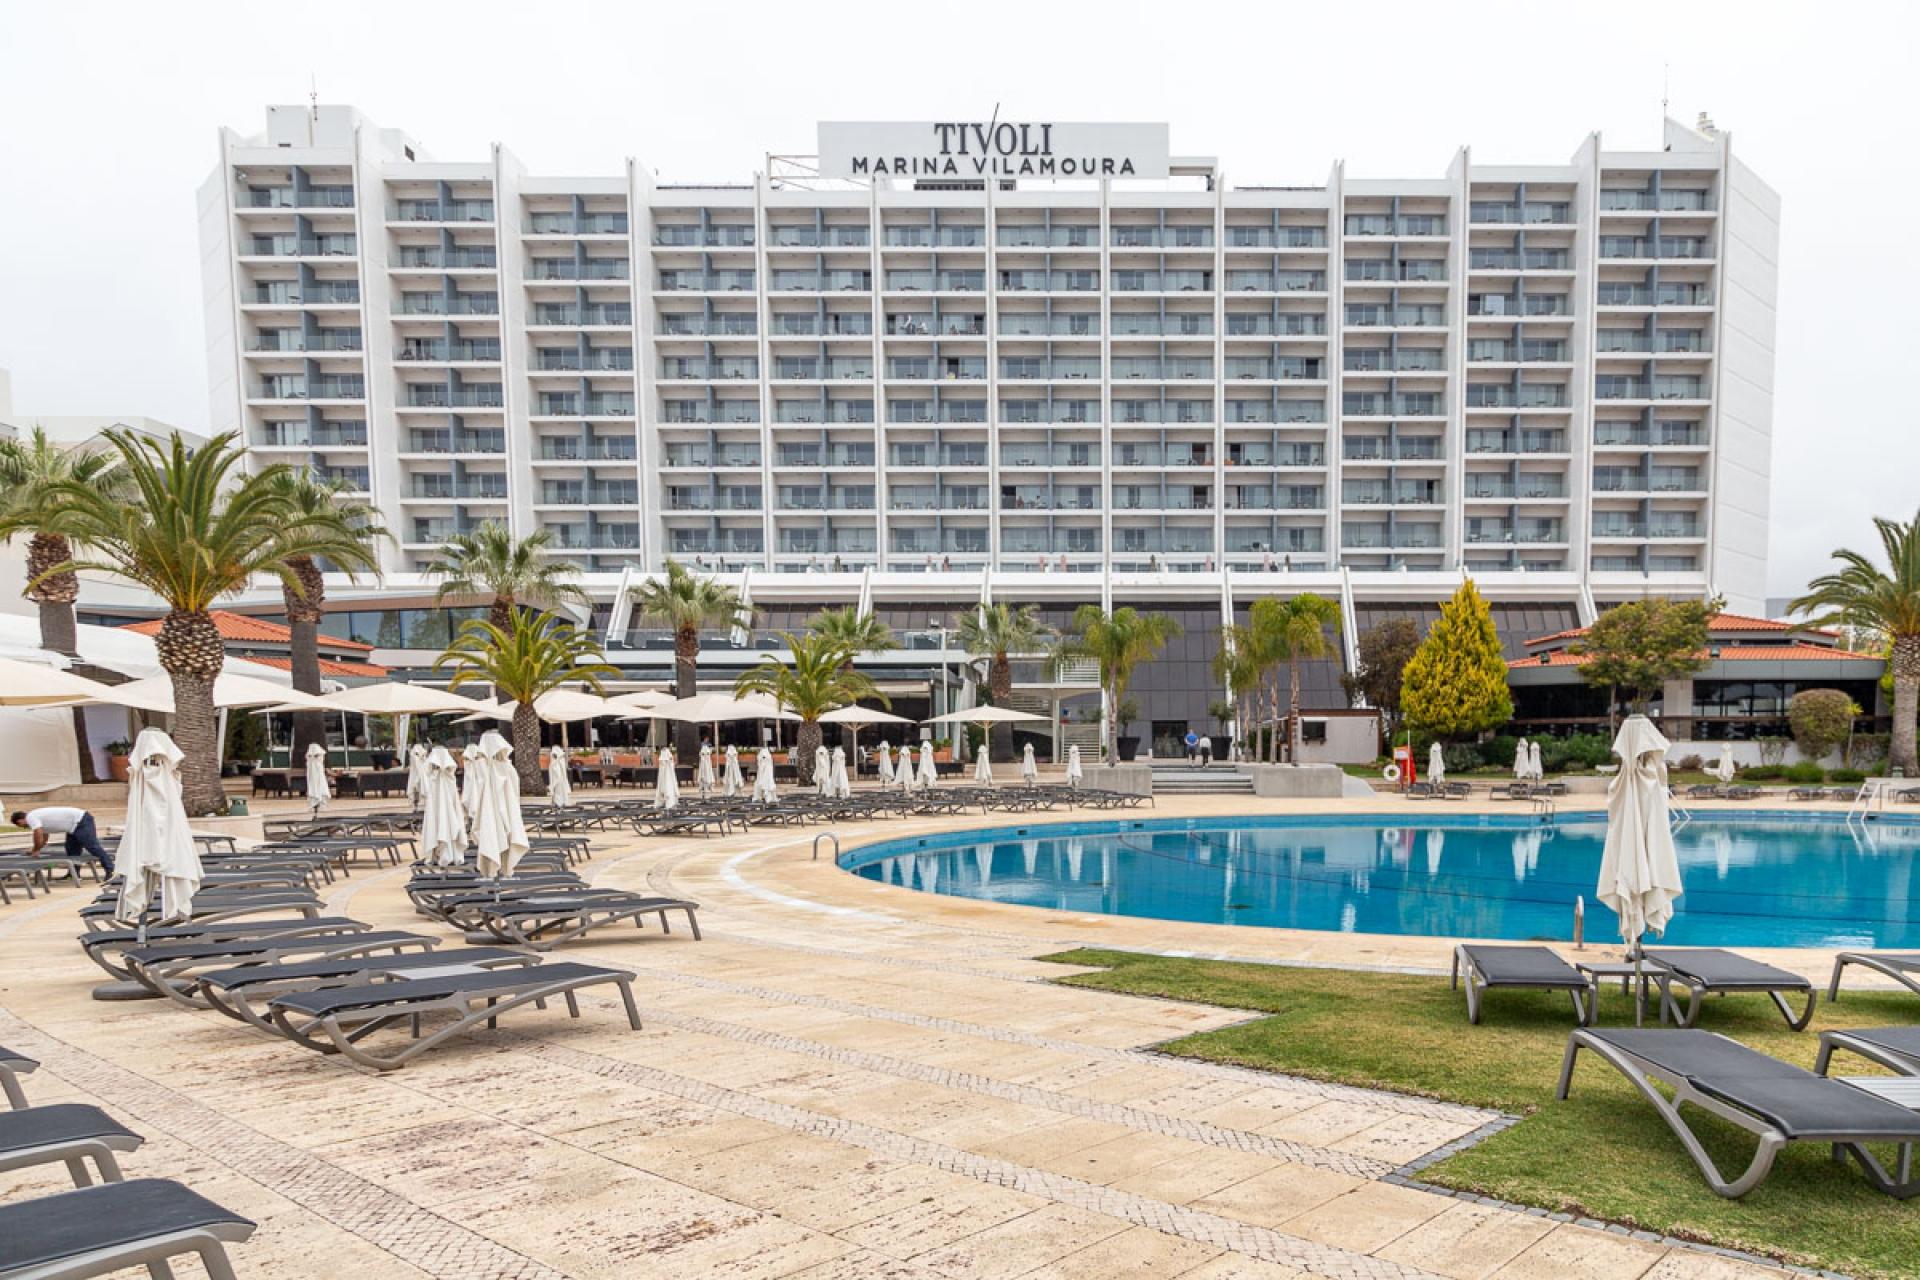 AlgraveCool_Dormir_Tivoli Marina Vilamoura Algarve Resort